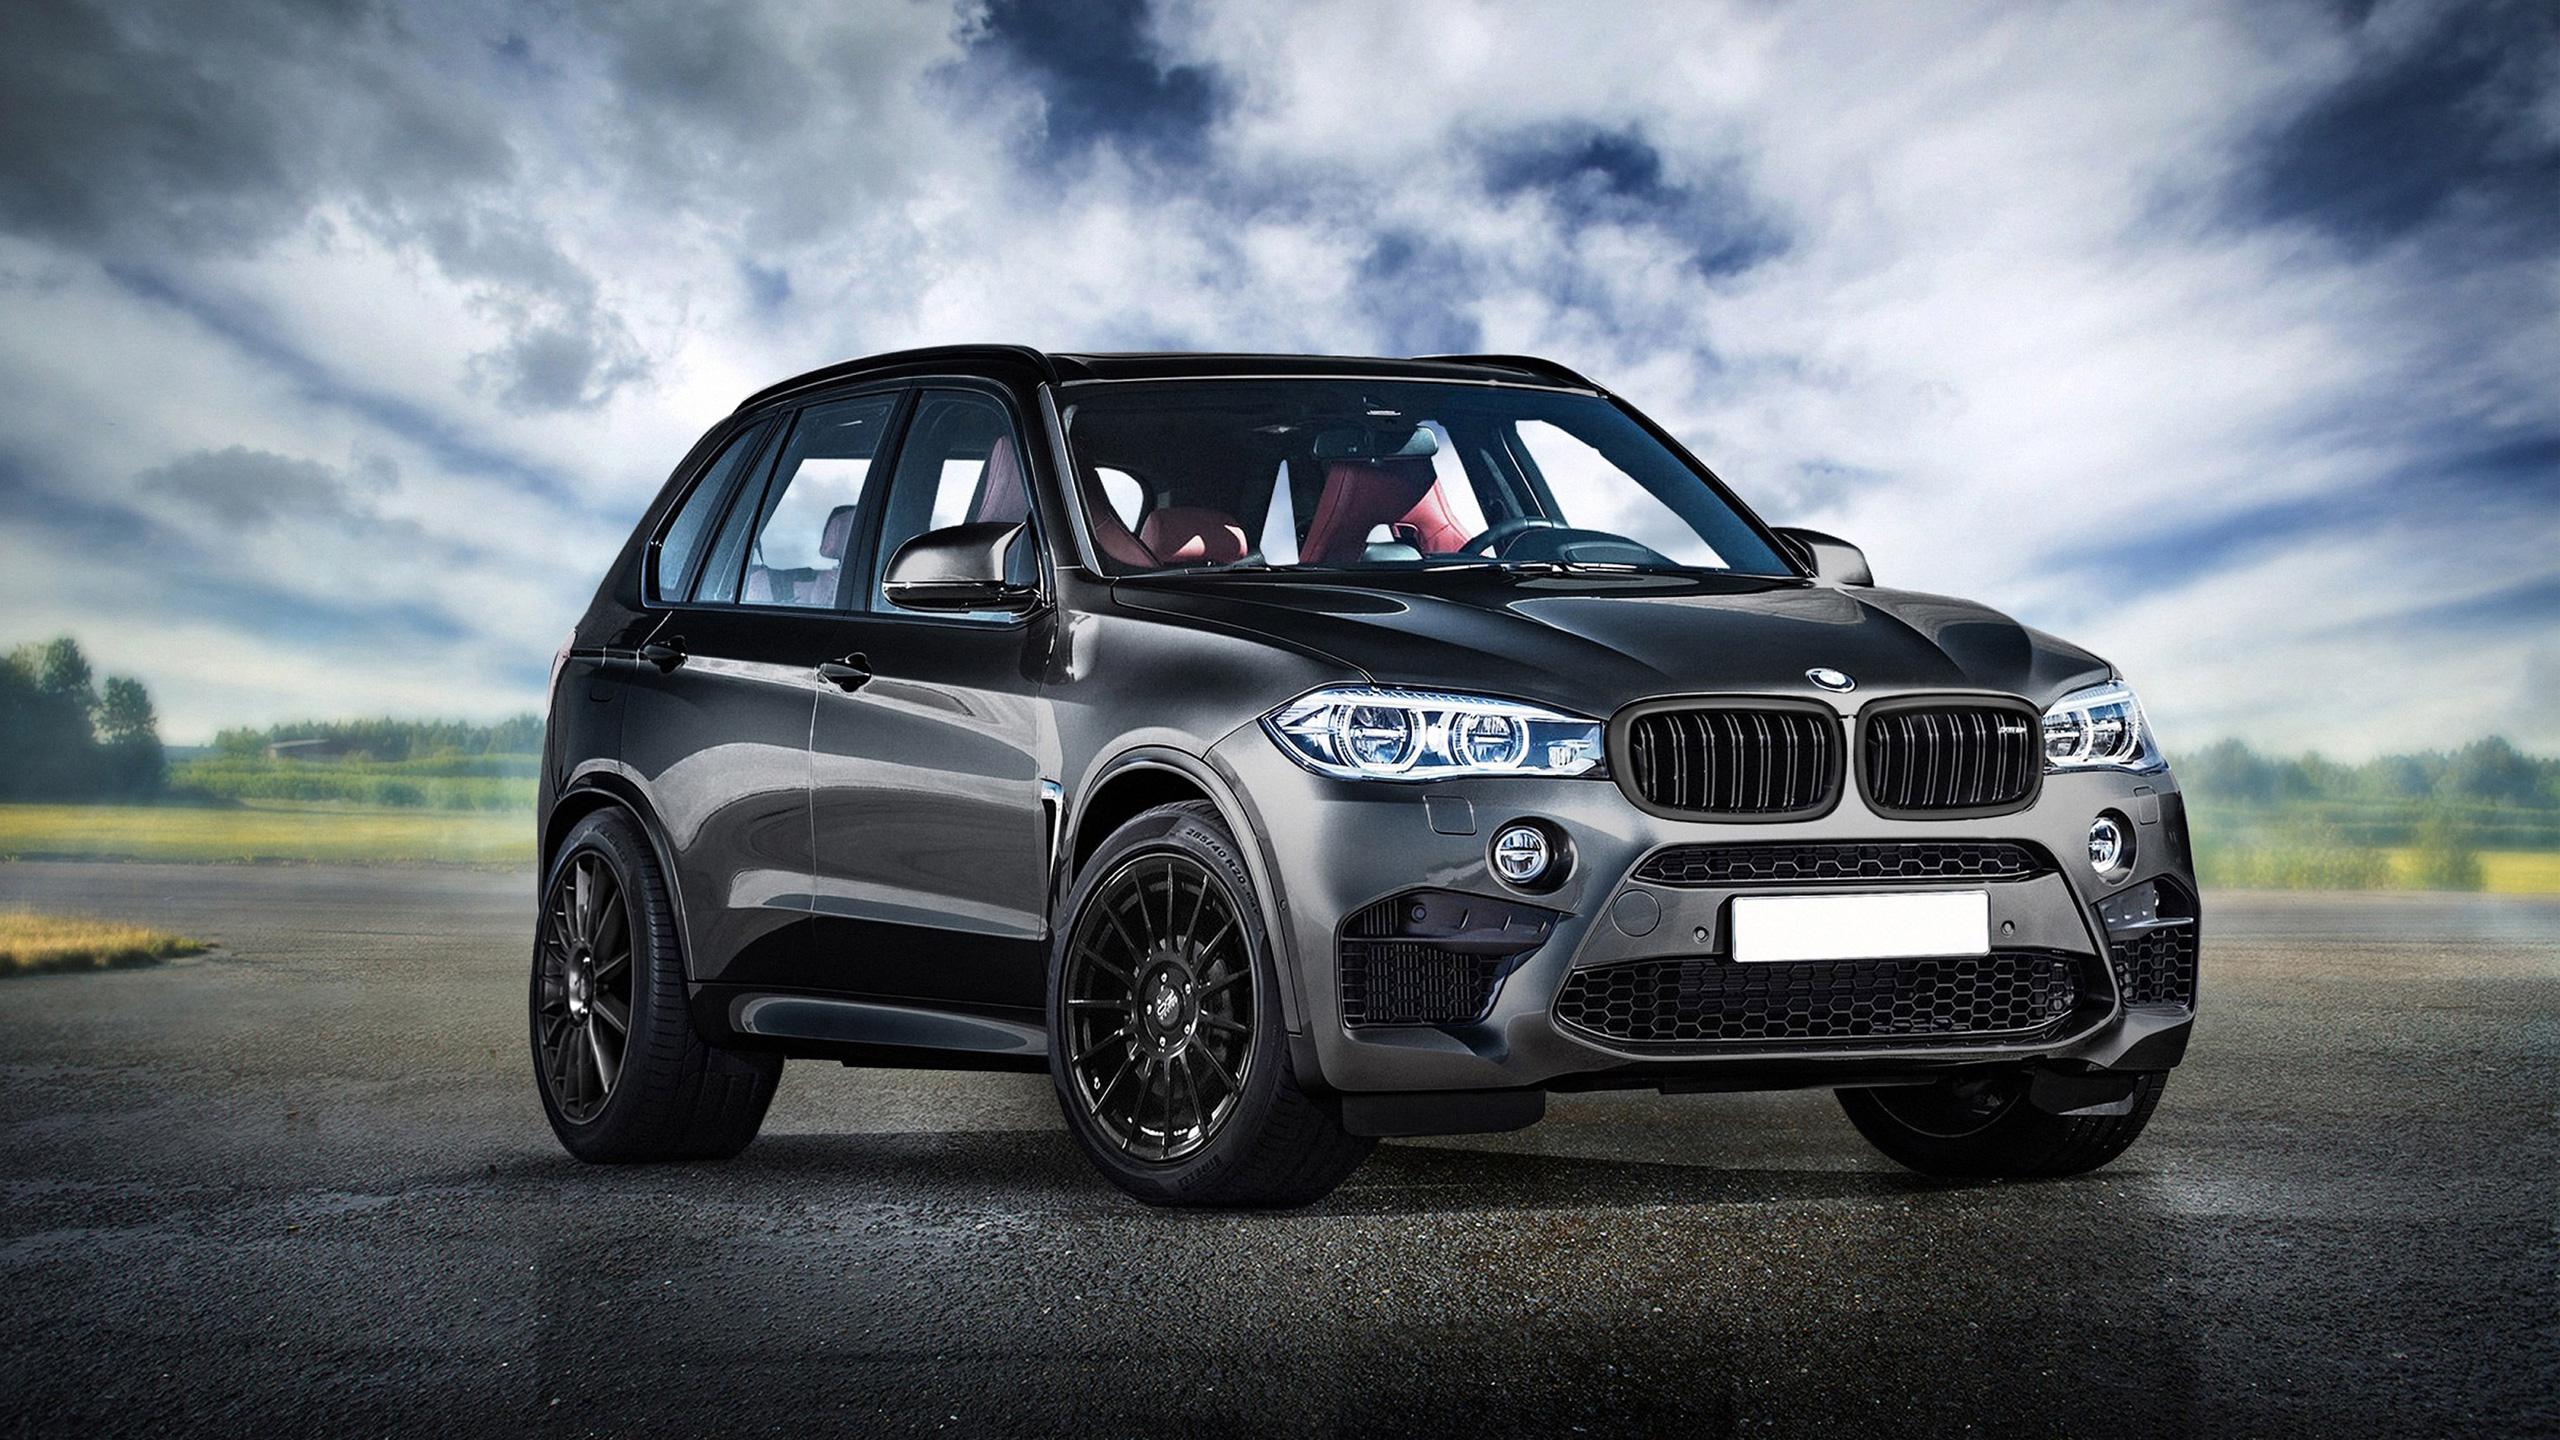 cool hd BMW X5 image